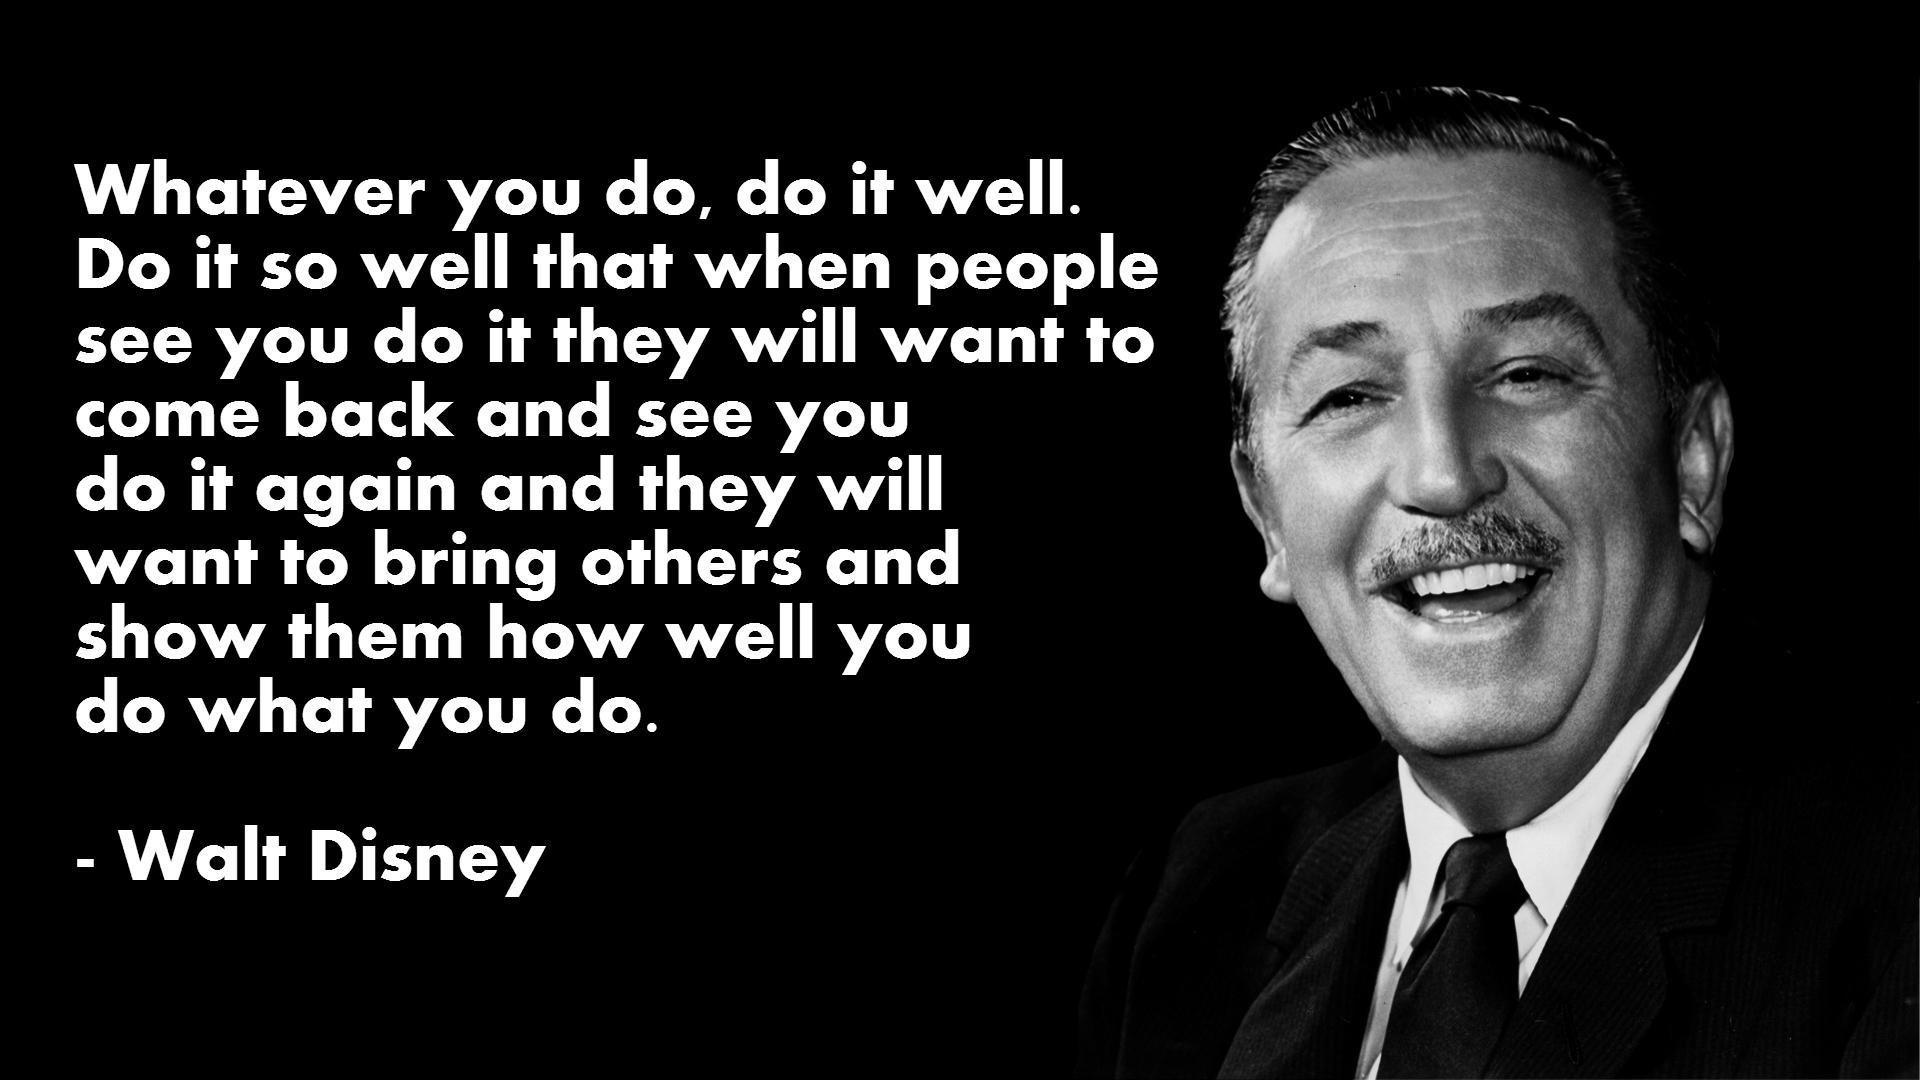 Walt Disney Quotes Wallpaper QuotesGram 1920x1080